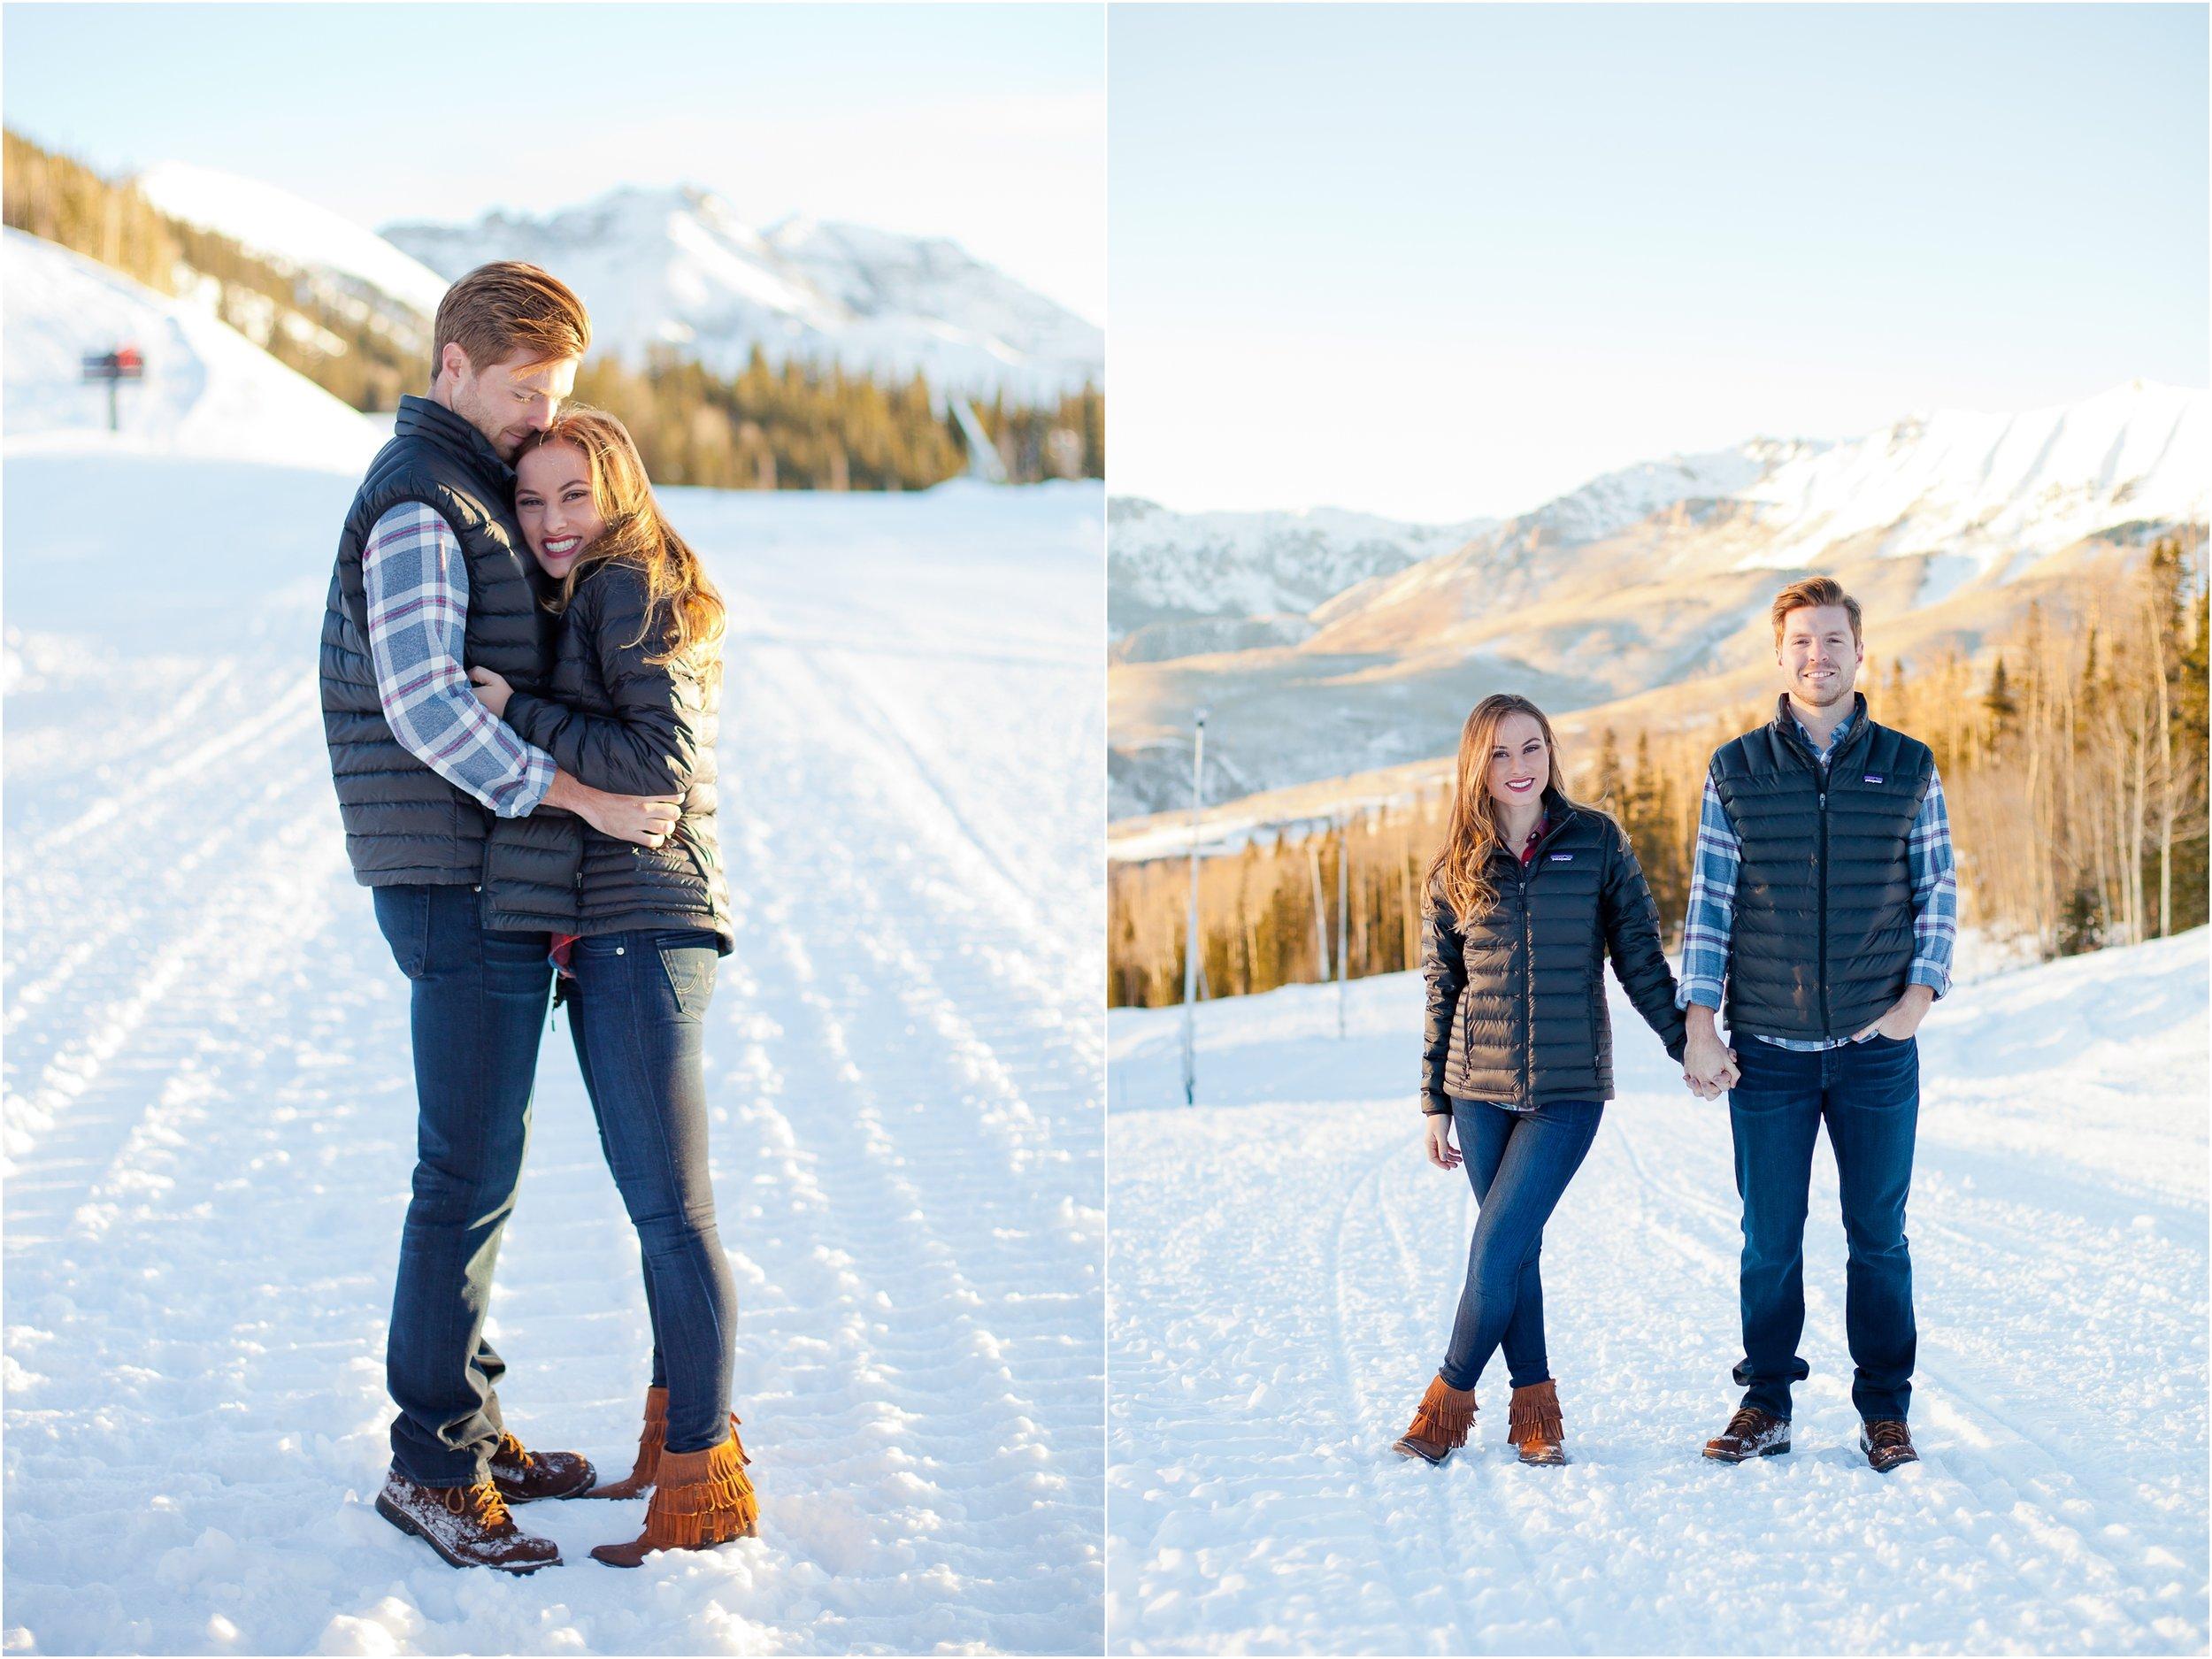 snowy-engagement-session-colorado.jpg